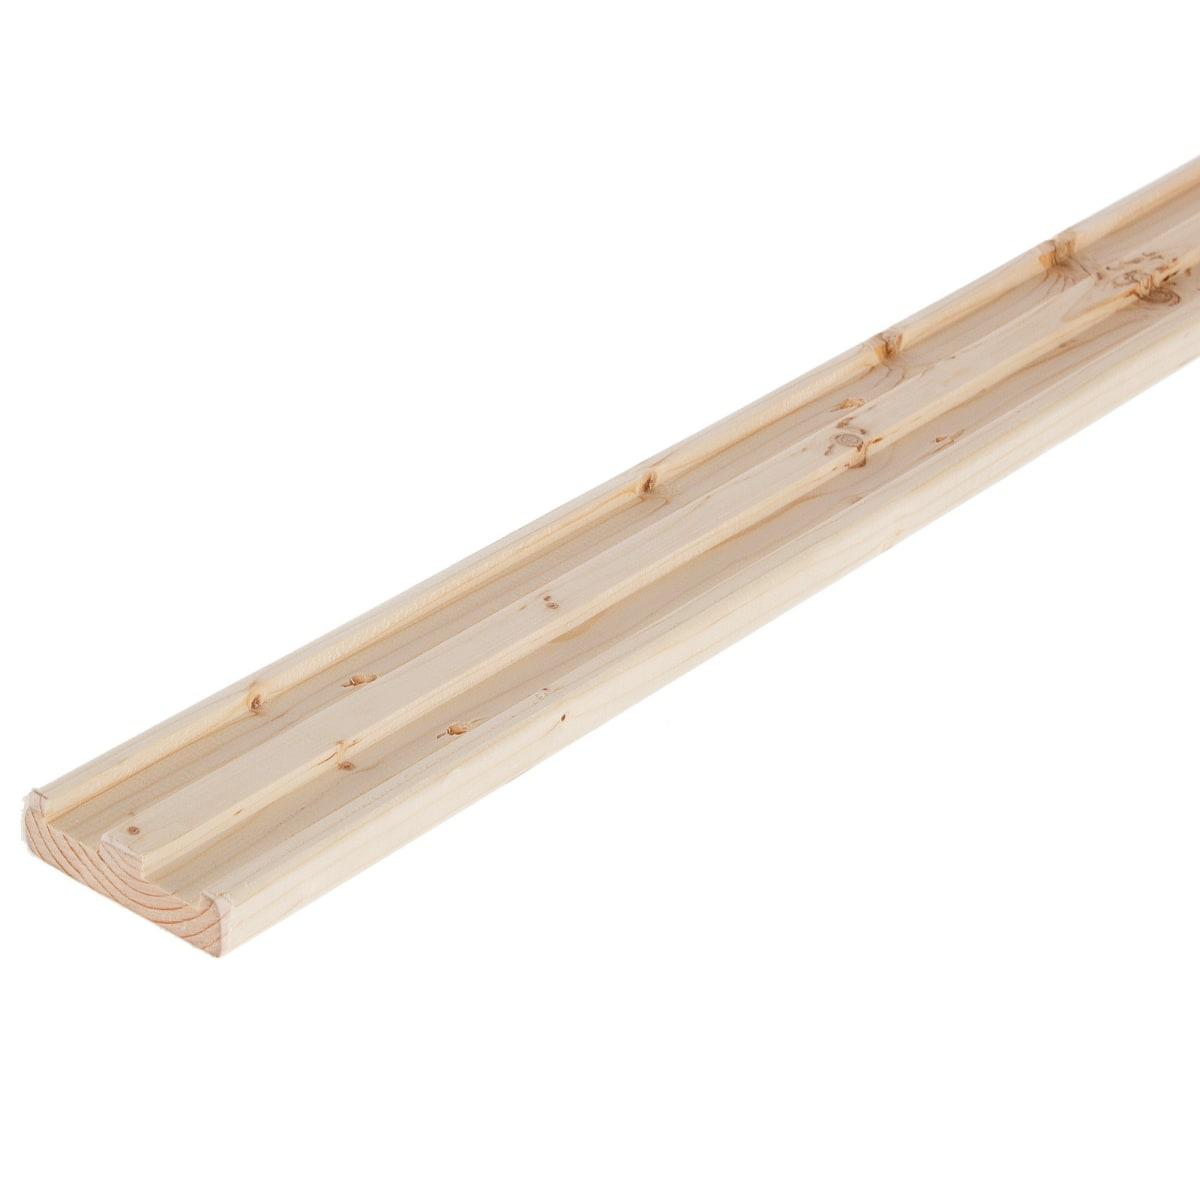 Стойка двупазная для стеллажа 1328х67х18 мм, дерево, 1 шт.